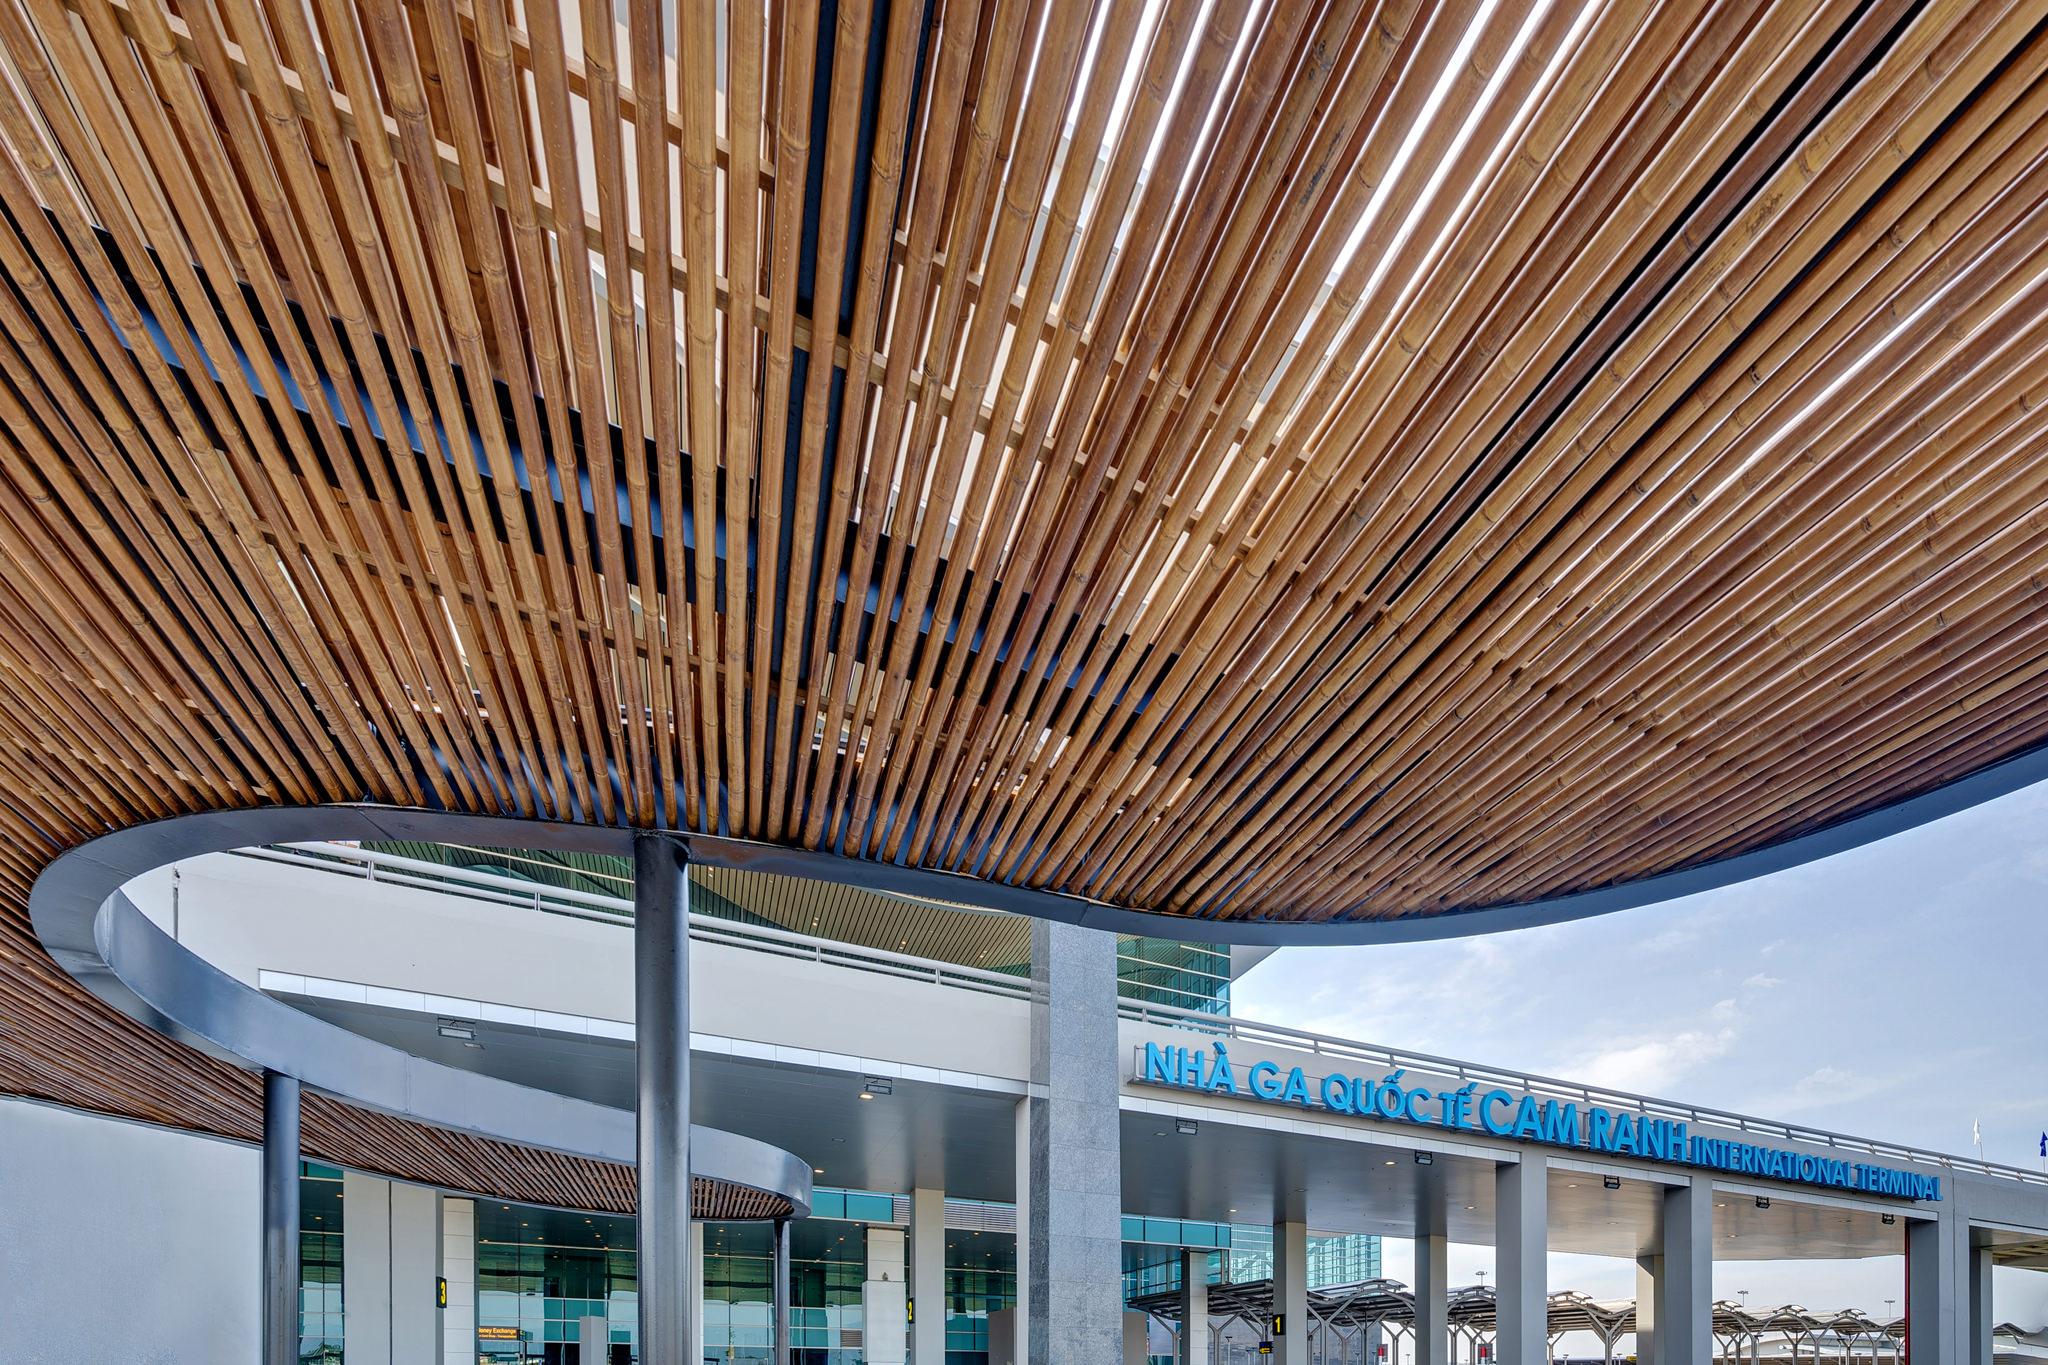 20180626 - Cam Ranh Airport - Architecture - 0259.jpg